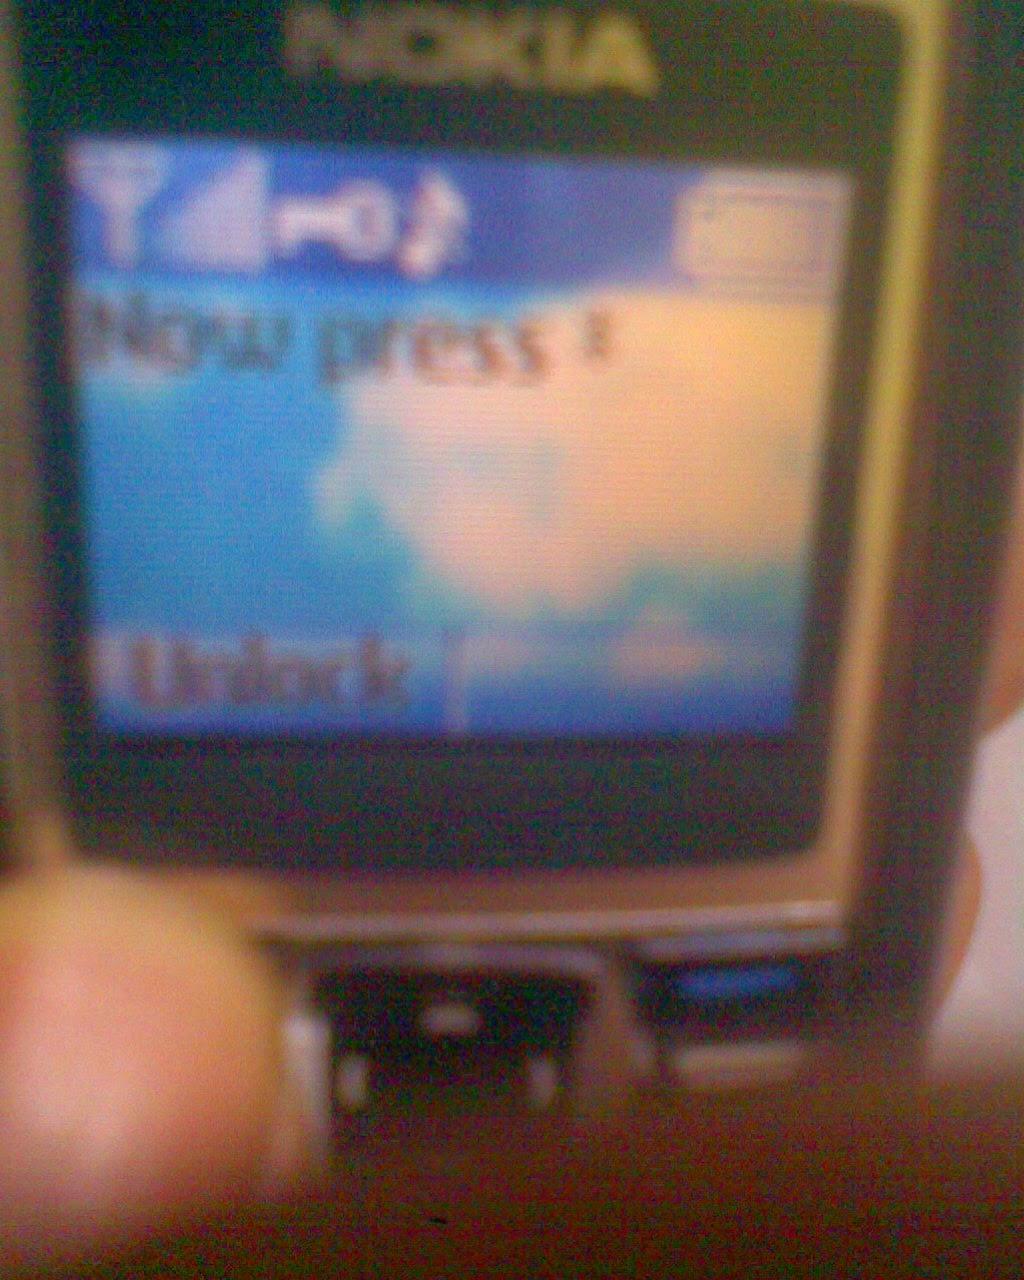 Menjebol Kode Keamanan Nokia  1600 | 2600 |1110i | 1200 | 1202 | 1208